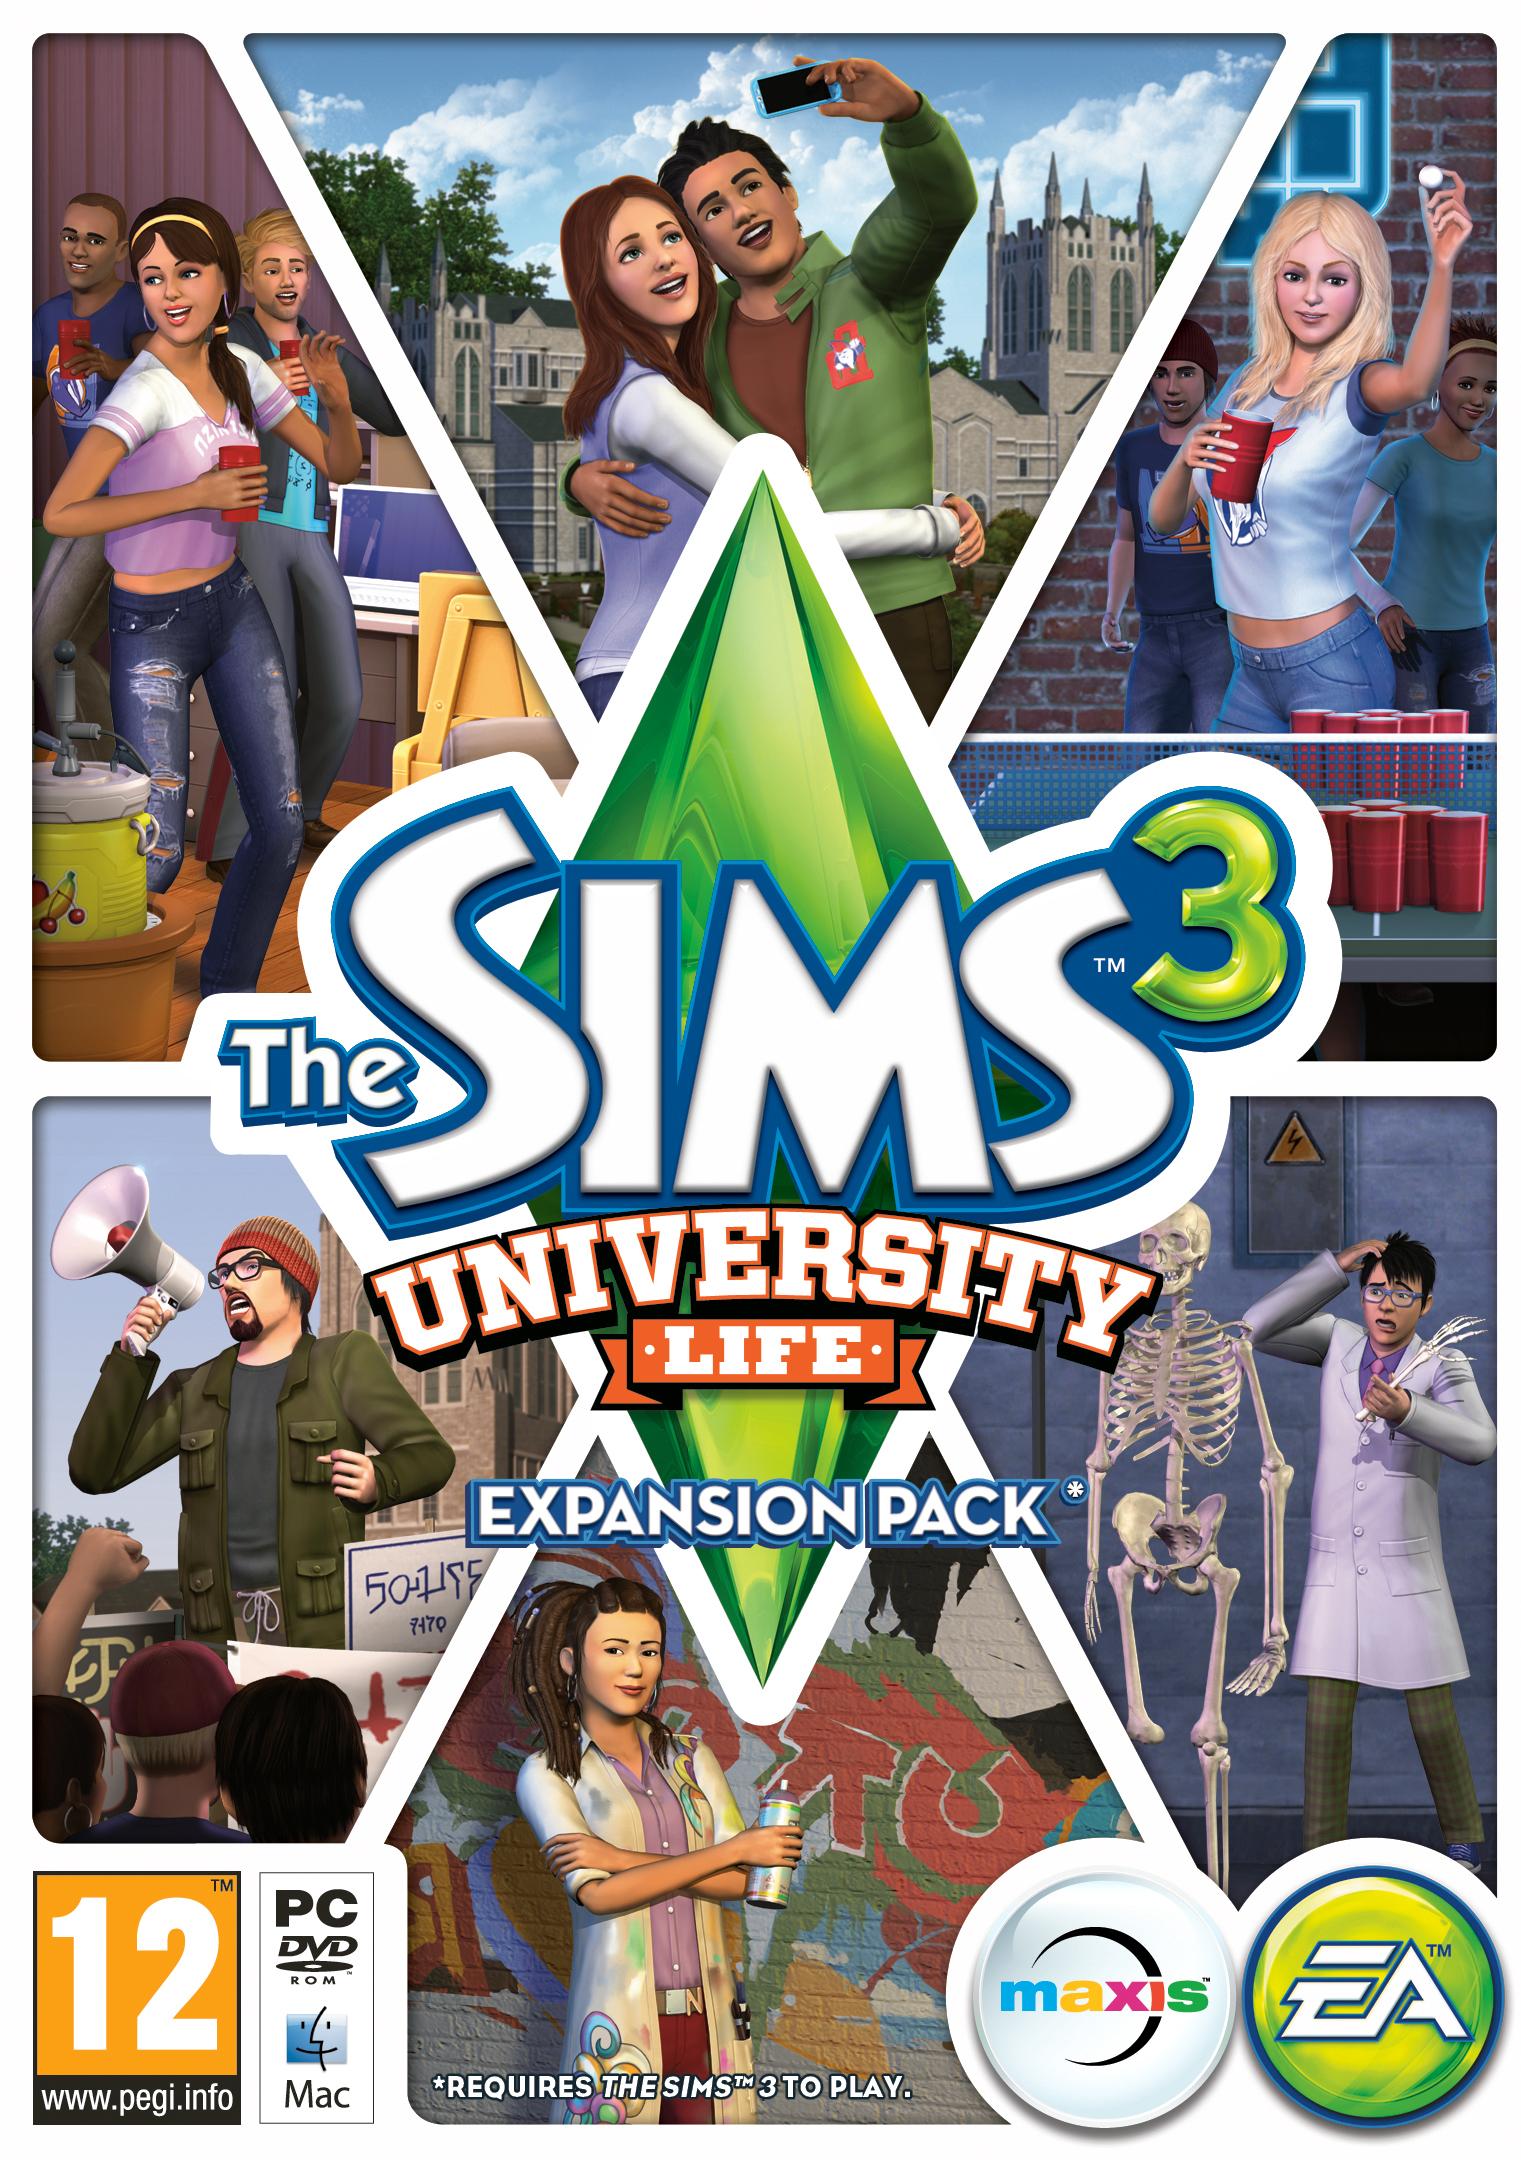 File:The sims 3 university life box art.jpg